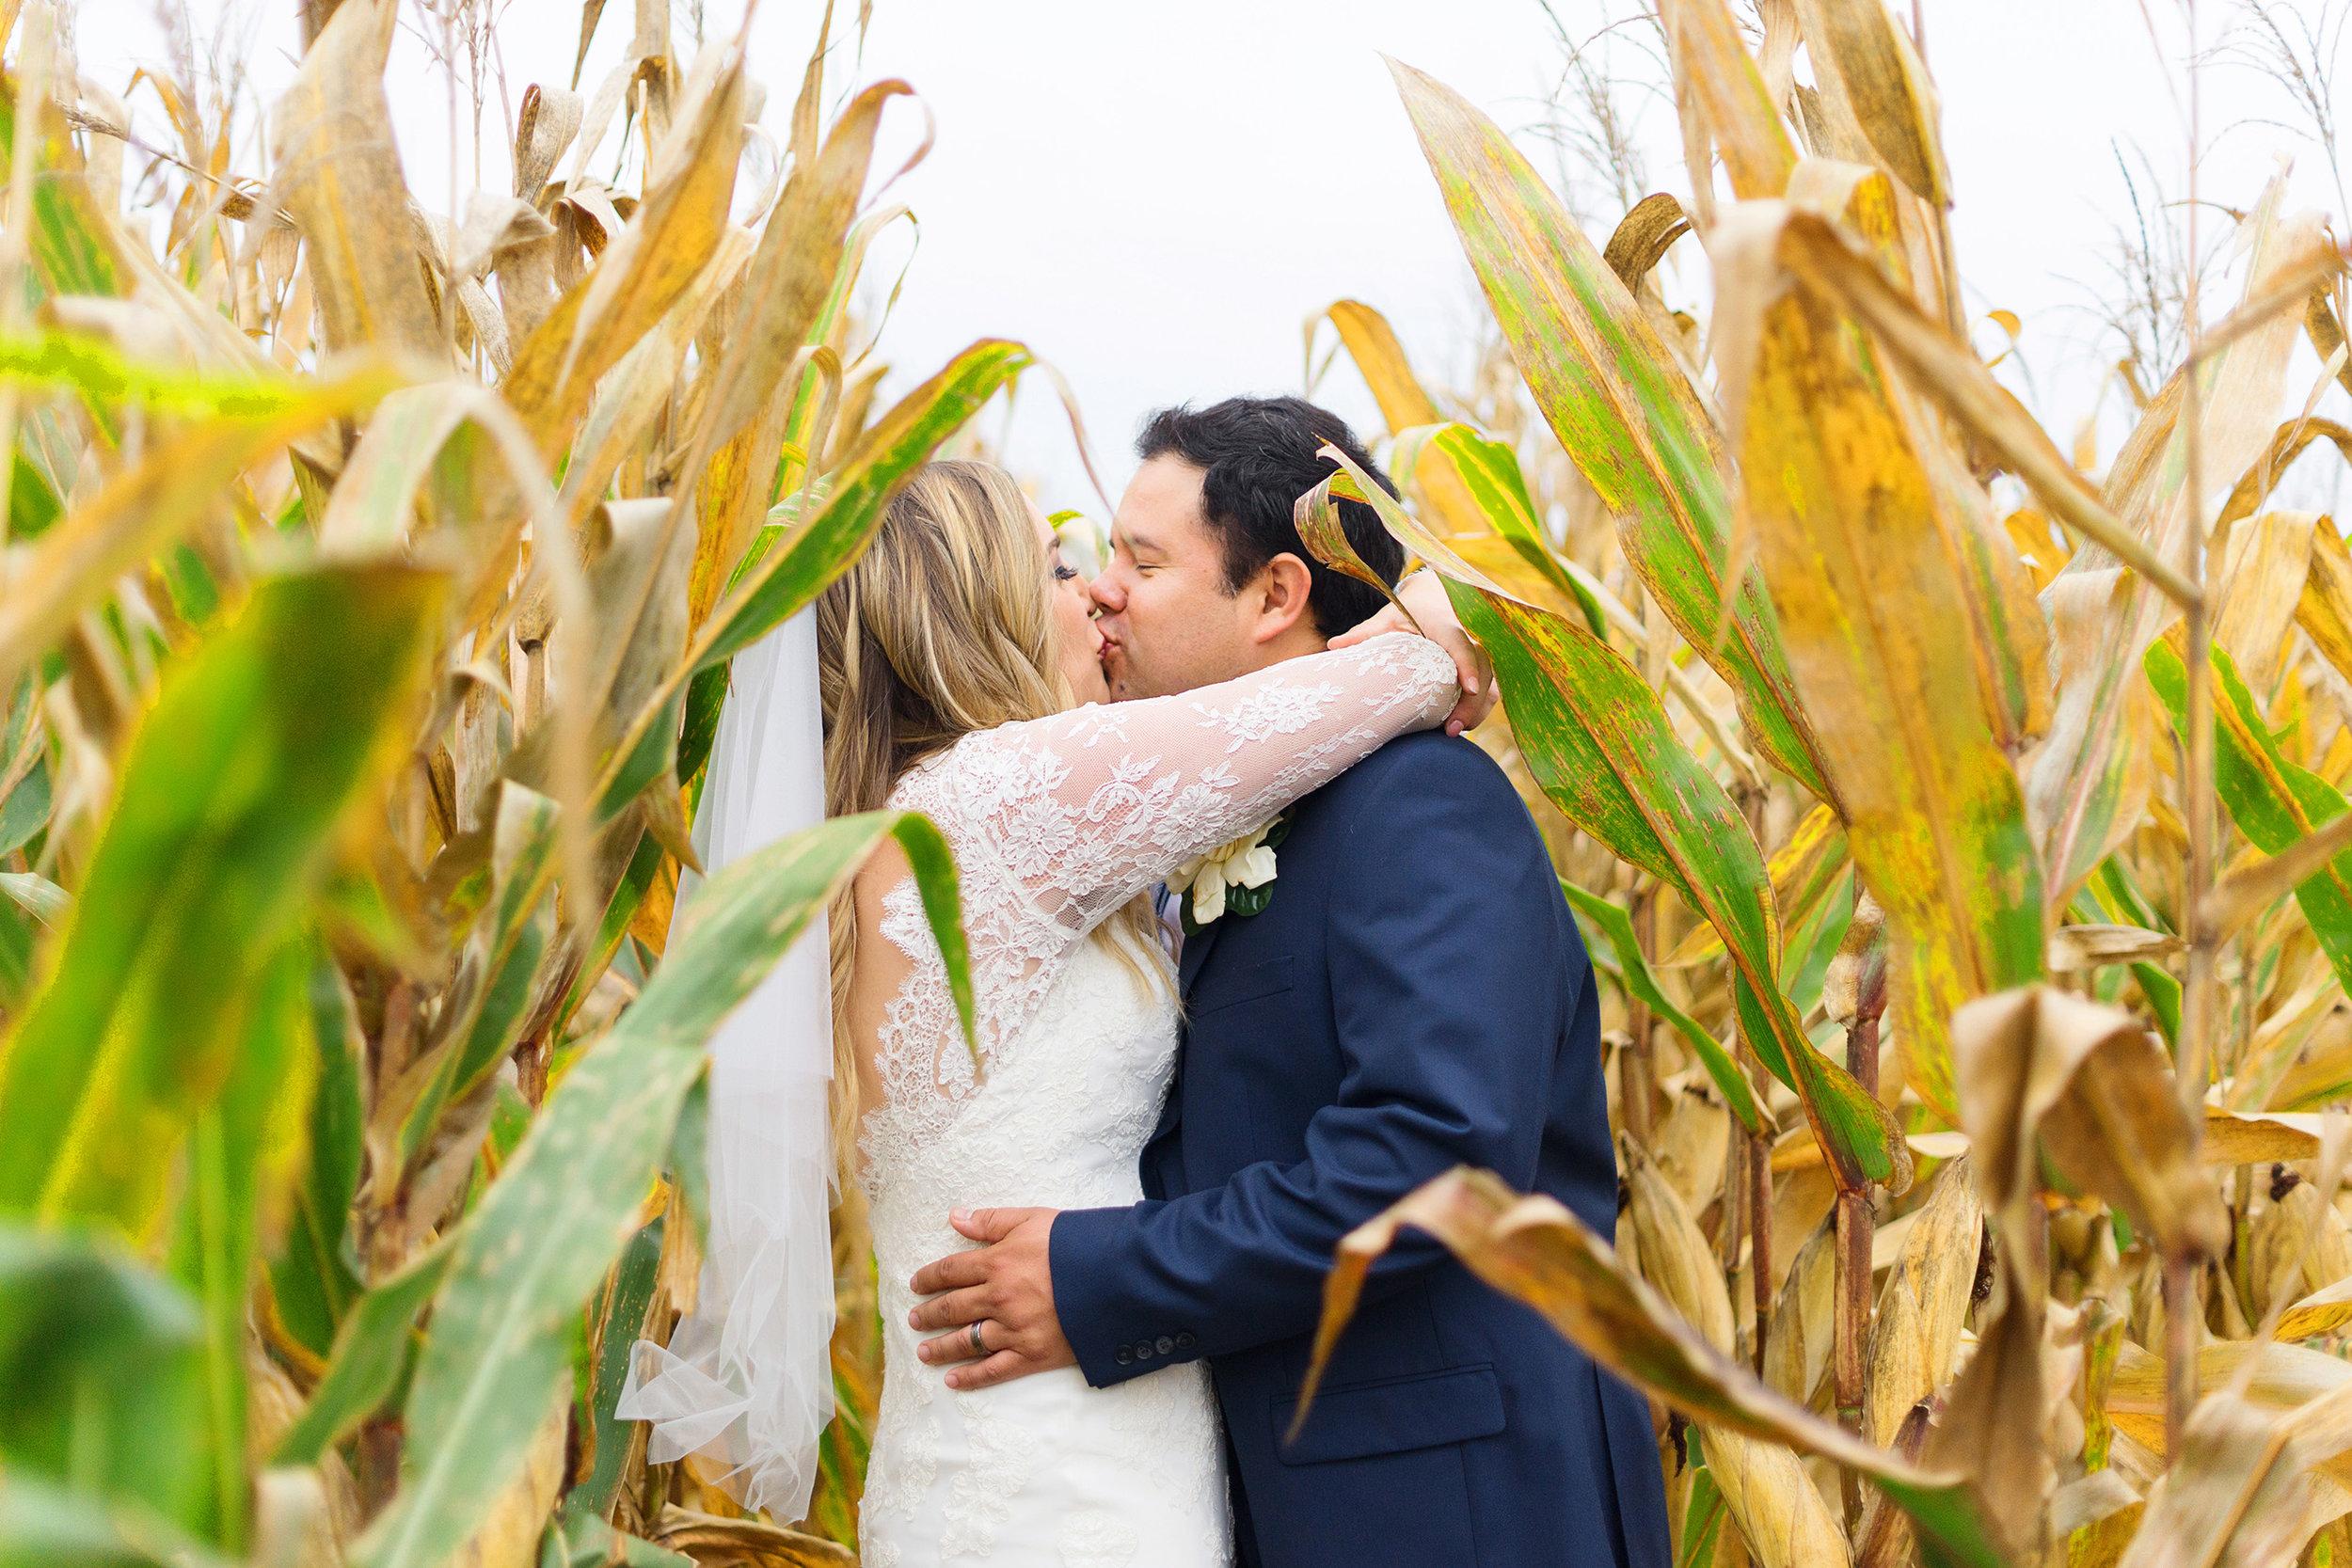 Corn field bride and groom wedding photos